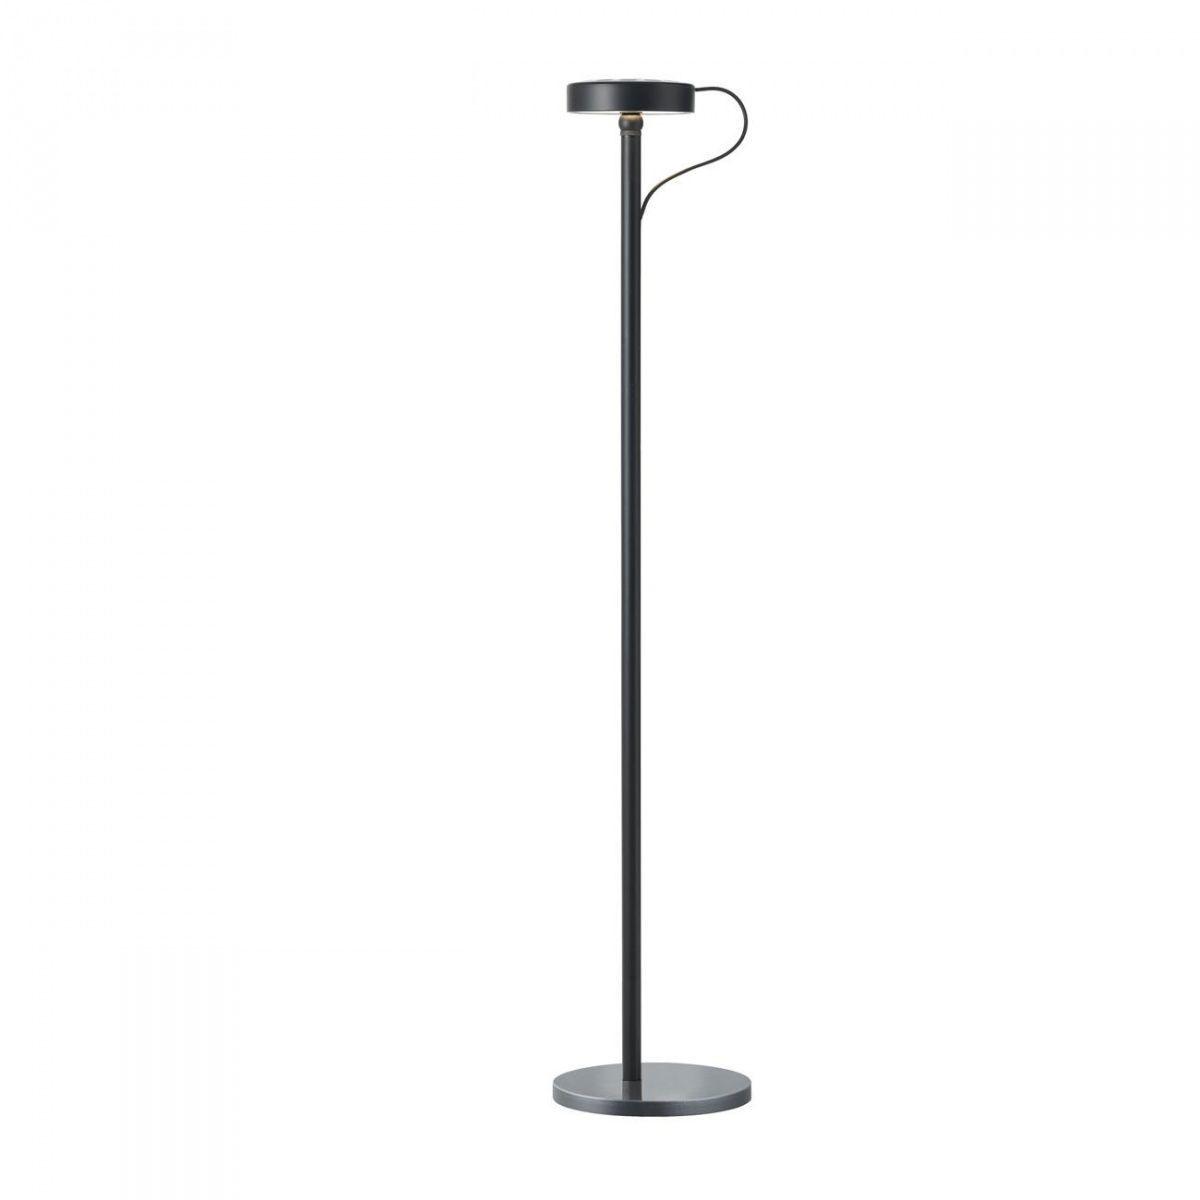 U-Turn 10 LED Floor Lamp | Belux | AmbienteDirect.com